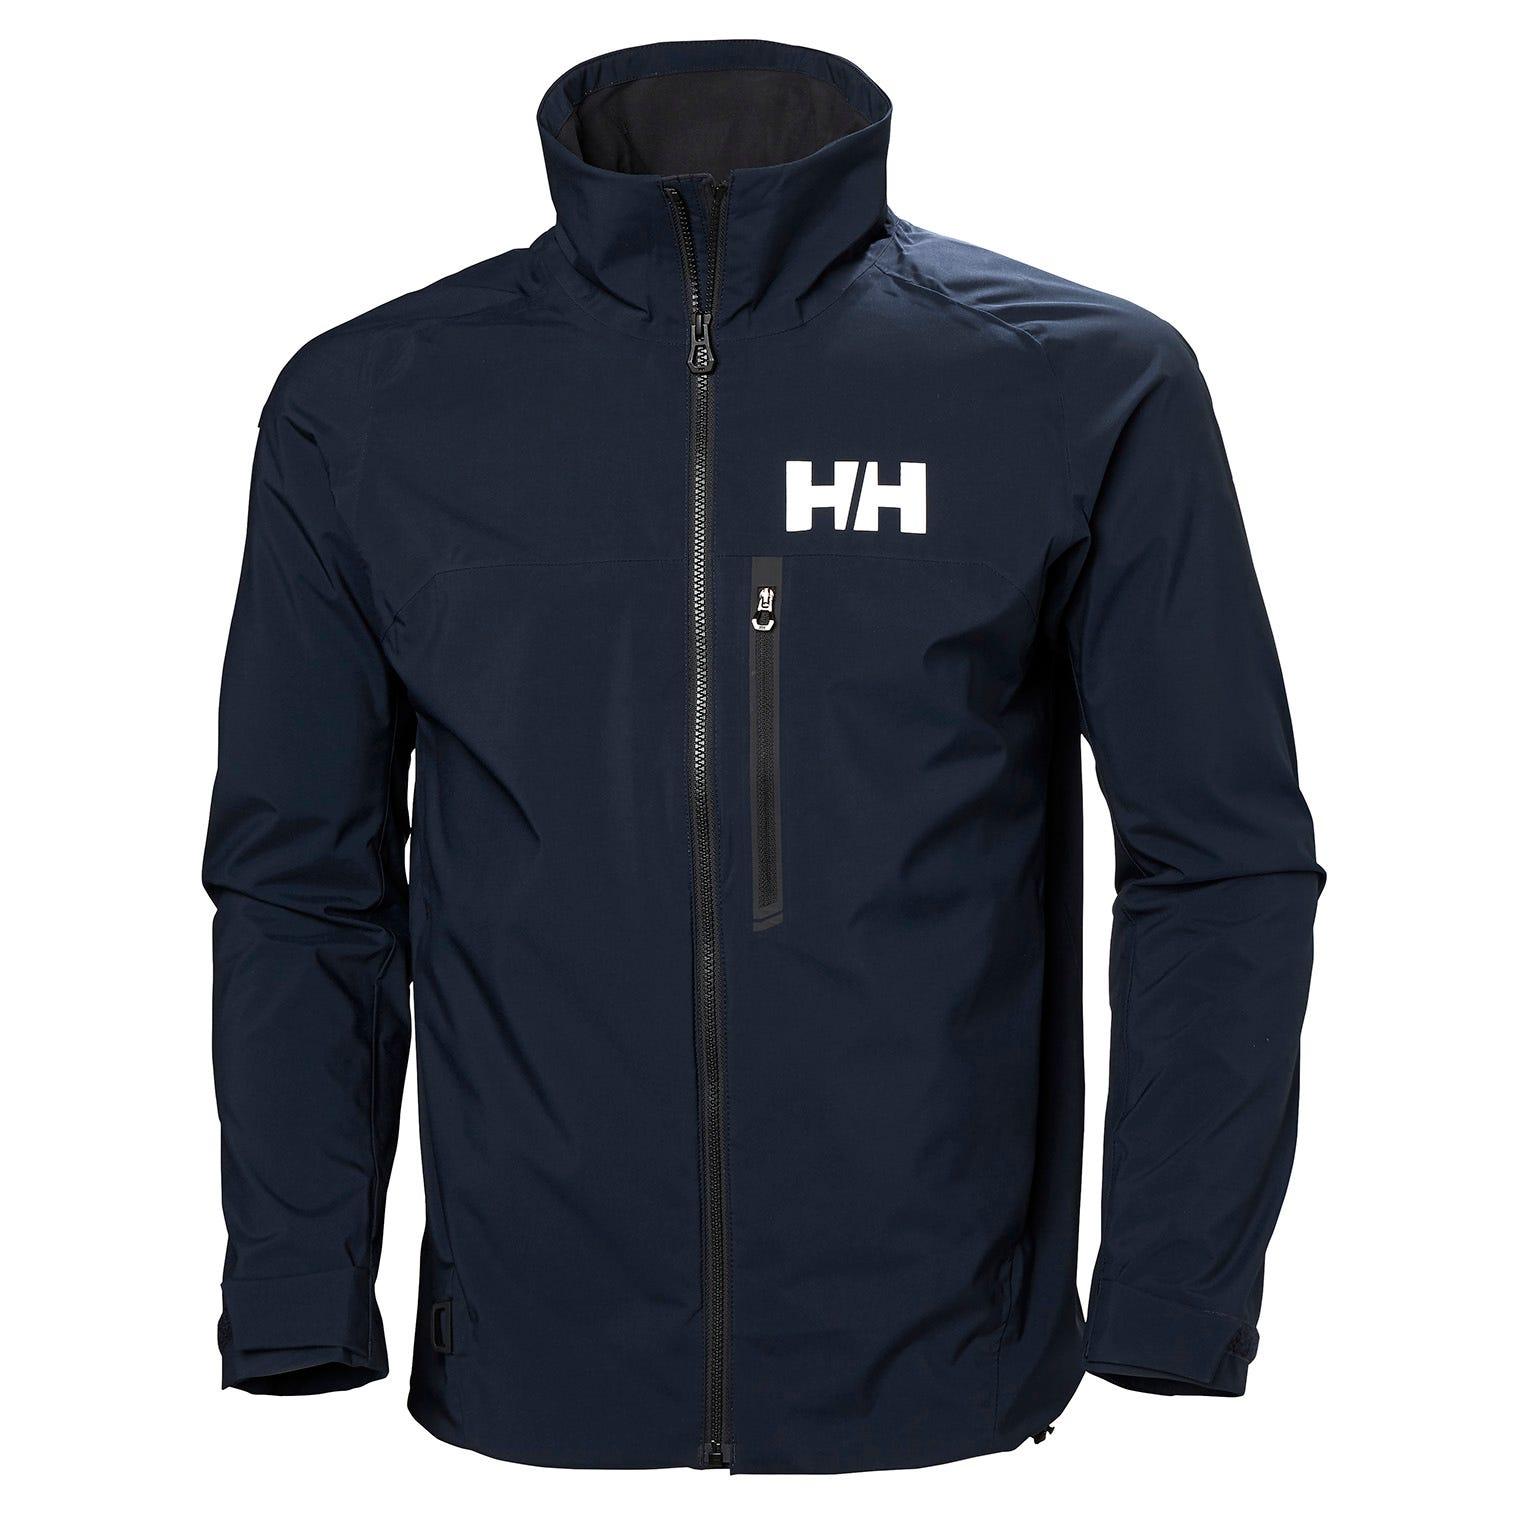 Helly Hansen Mens Sailing Jacket Navy L